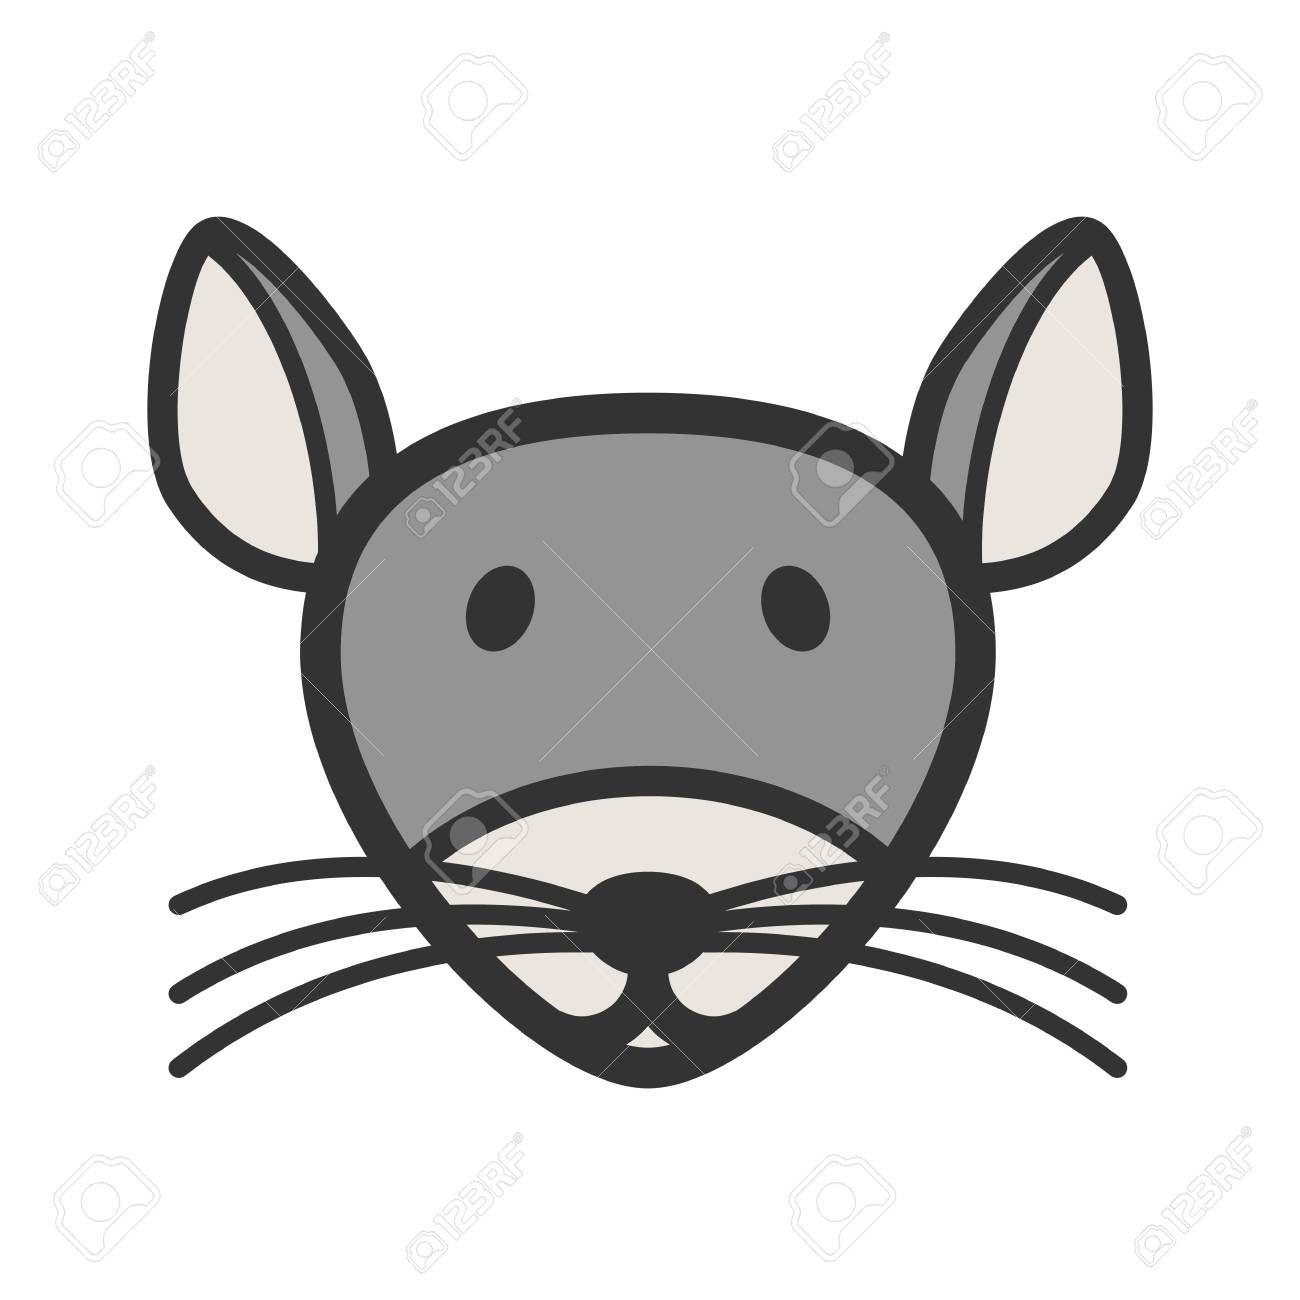 Mouse Face Icon Cartoon Illustration Illustration Ad Icon Face Mouse Illustration Illustration Cartoon Illustration Face Icon Illustration